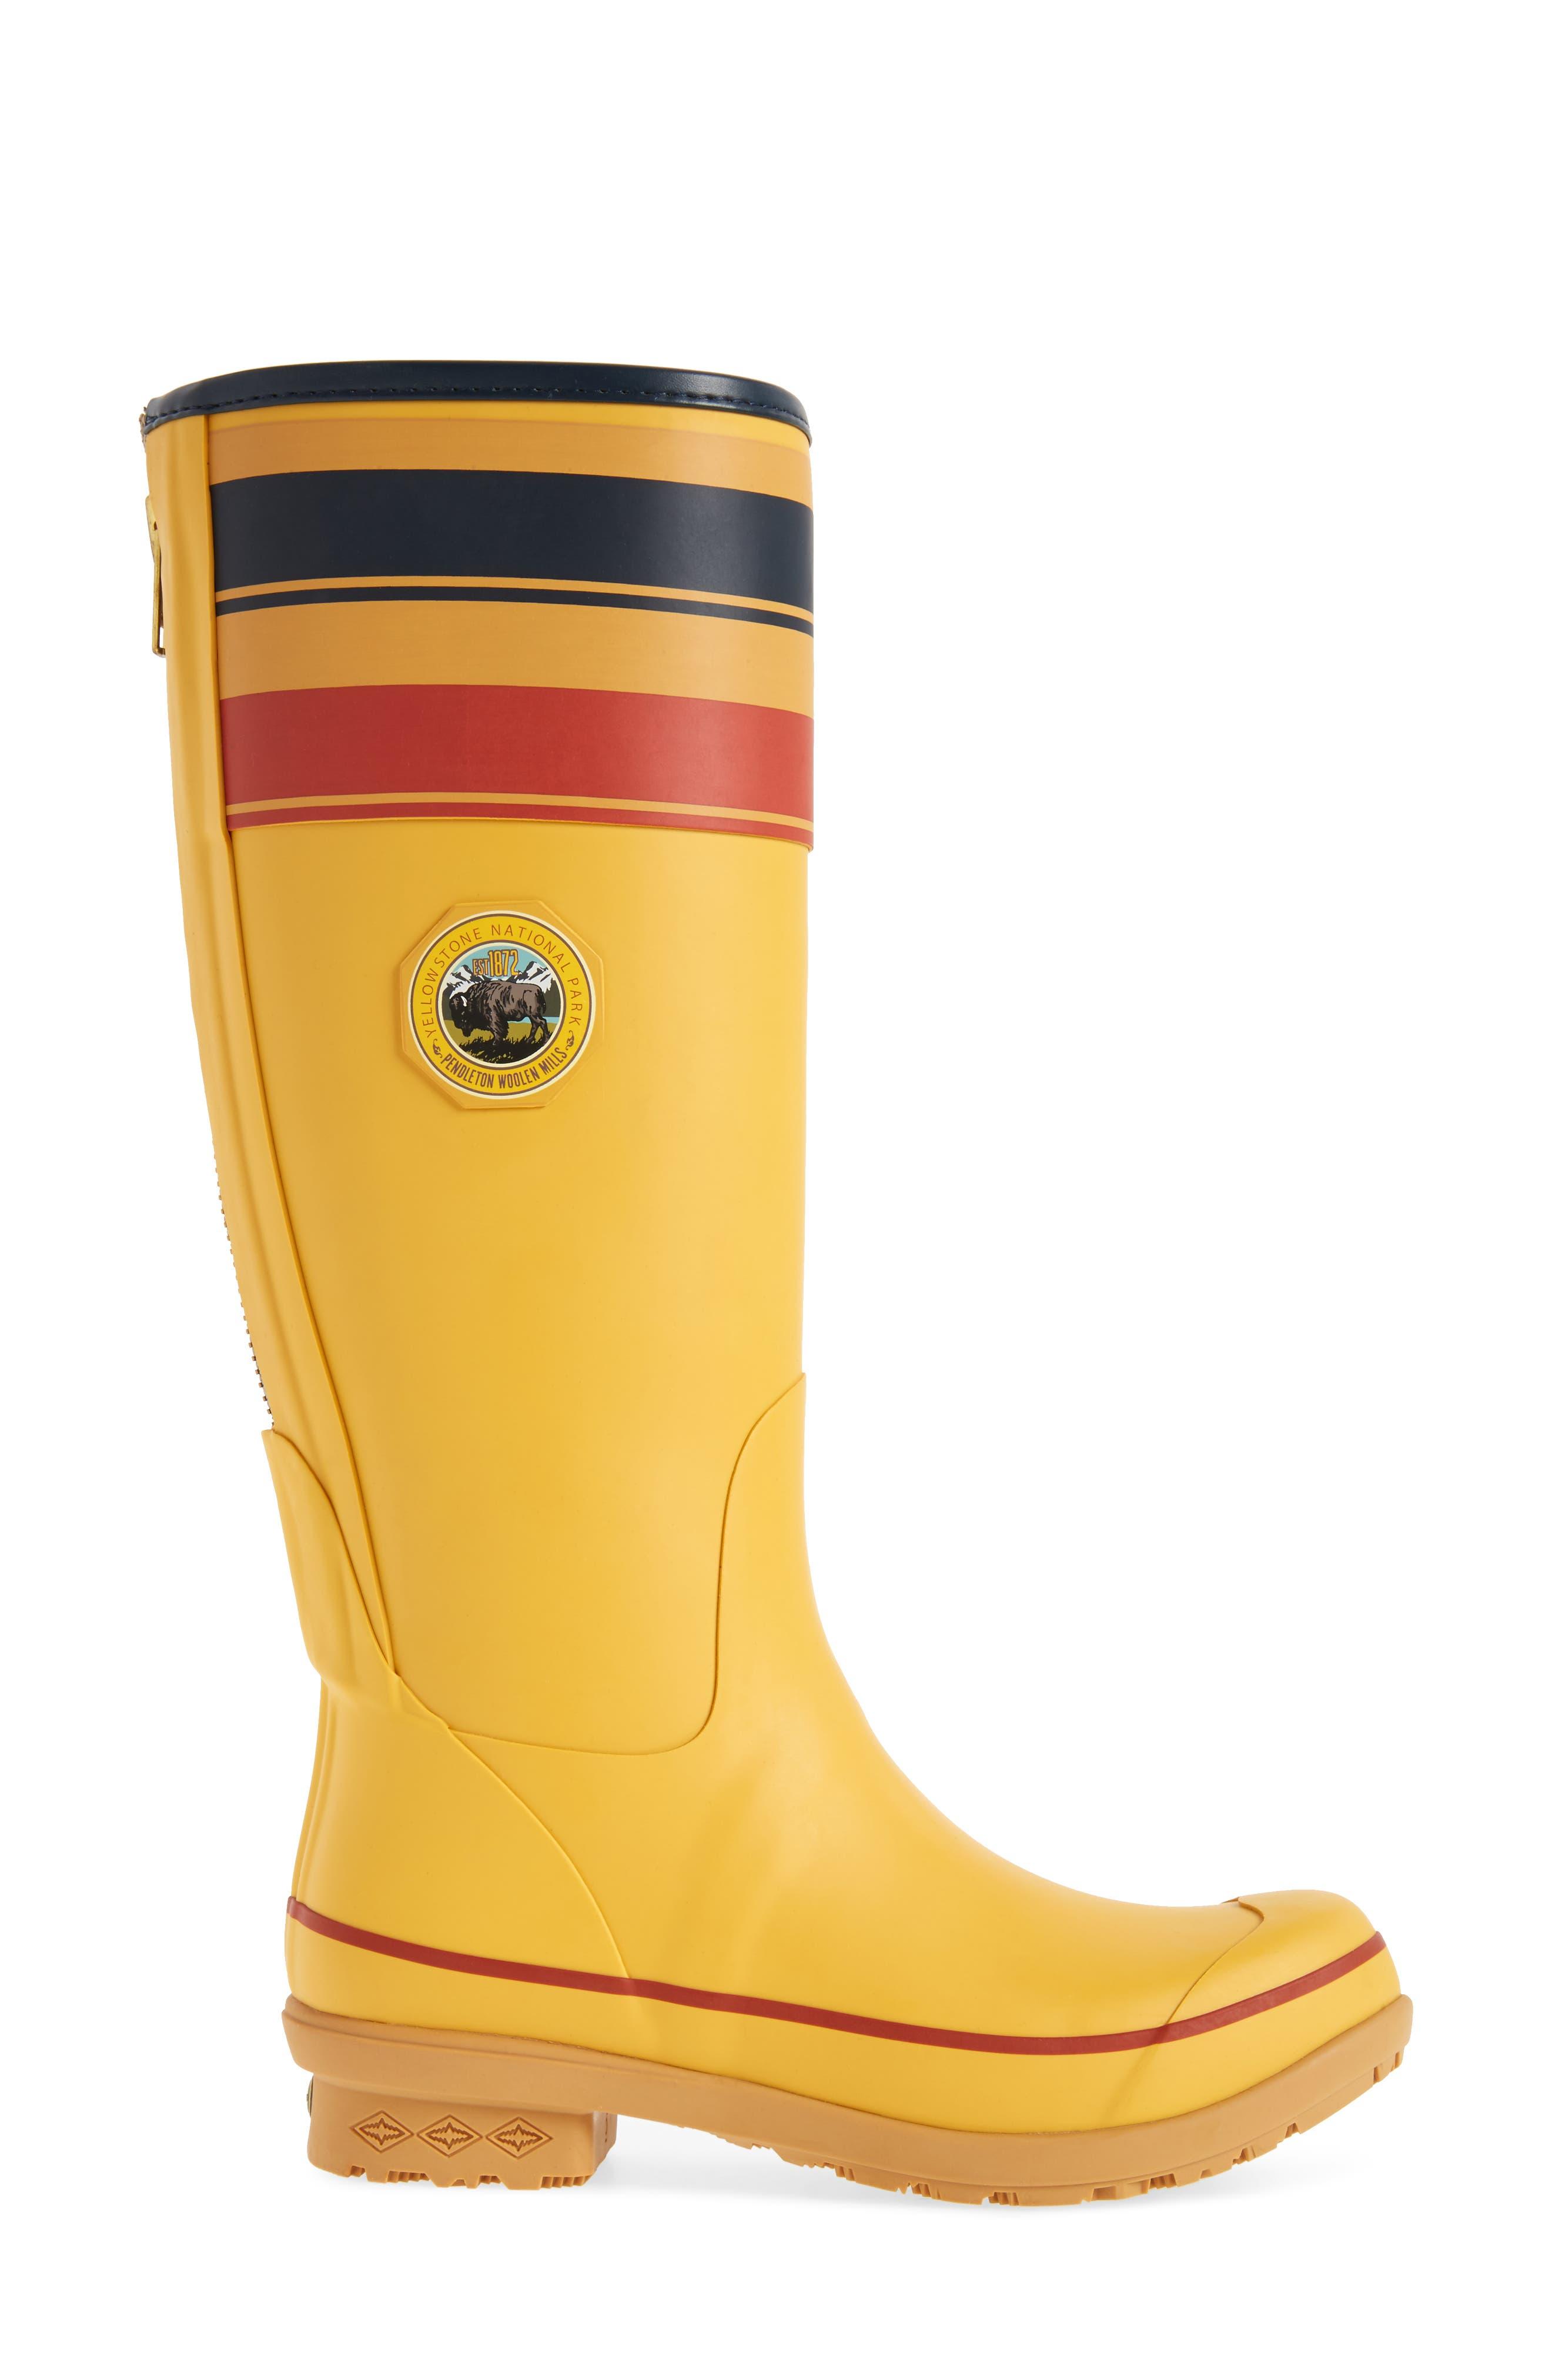 Pendleton Yellowstone National Park Tall Rain Boot,                             Alternate thumbnail 3, color,                             YELLOW